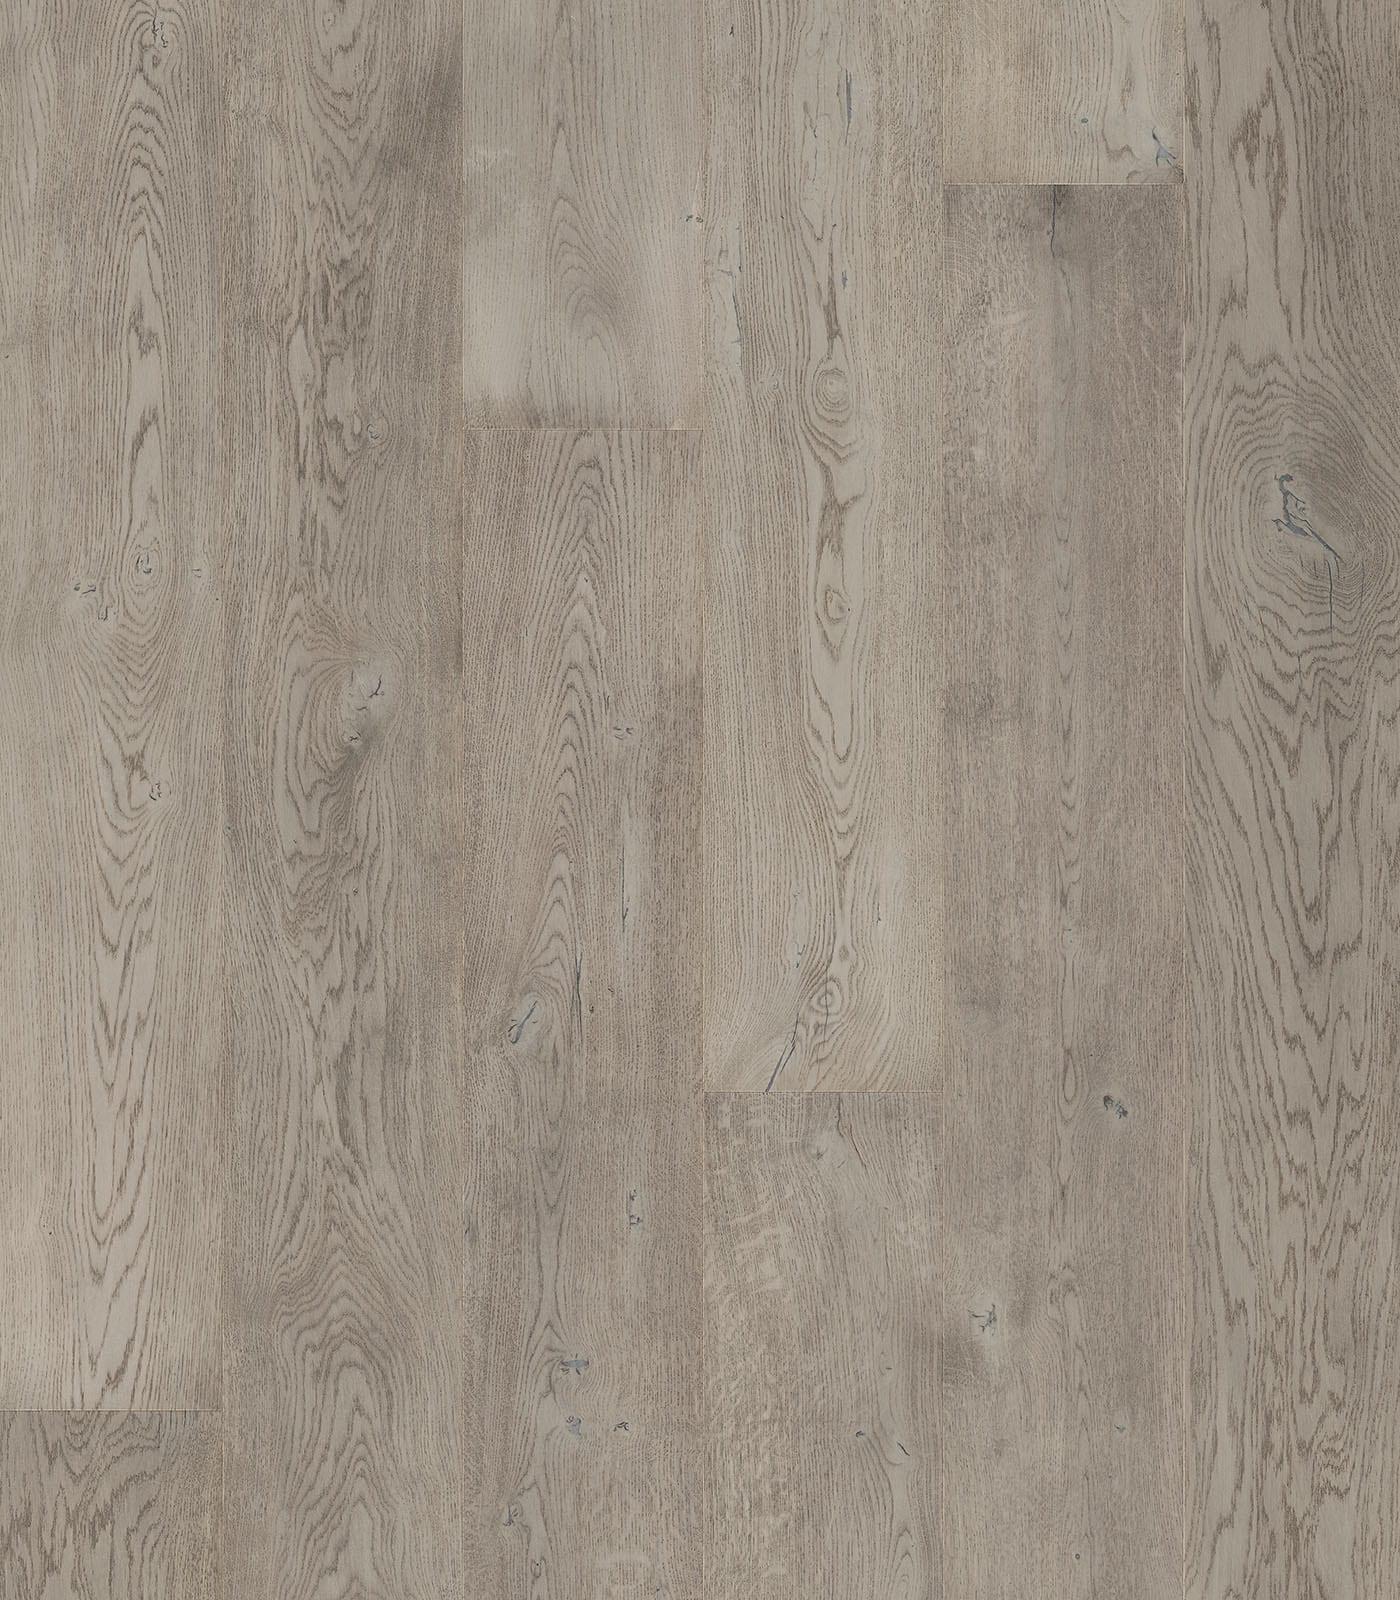 Naples-European Oak floors-Lifestyle collection-flat